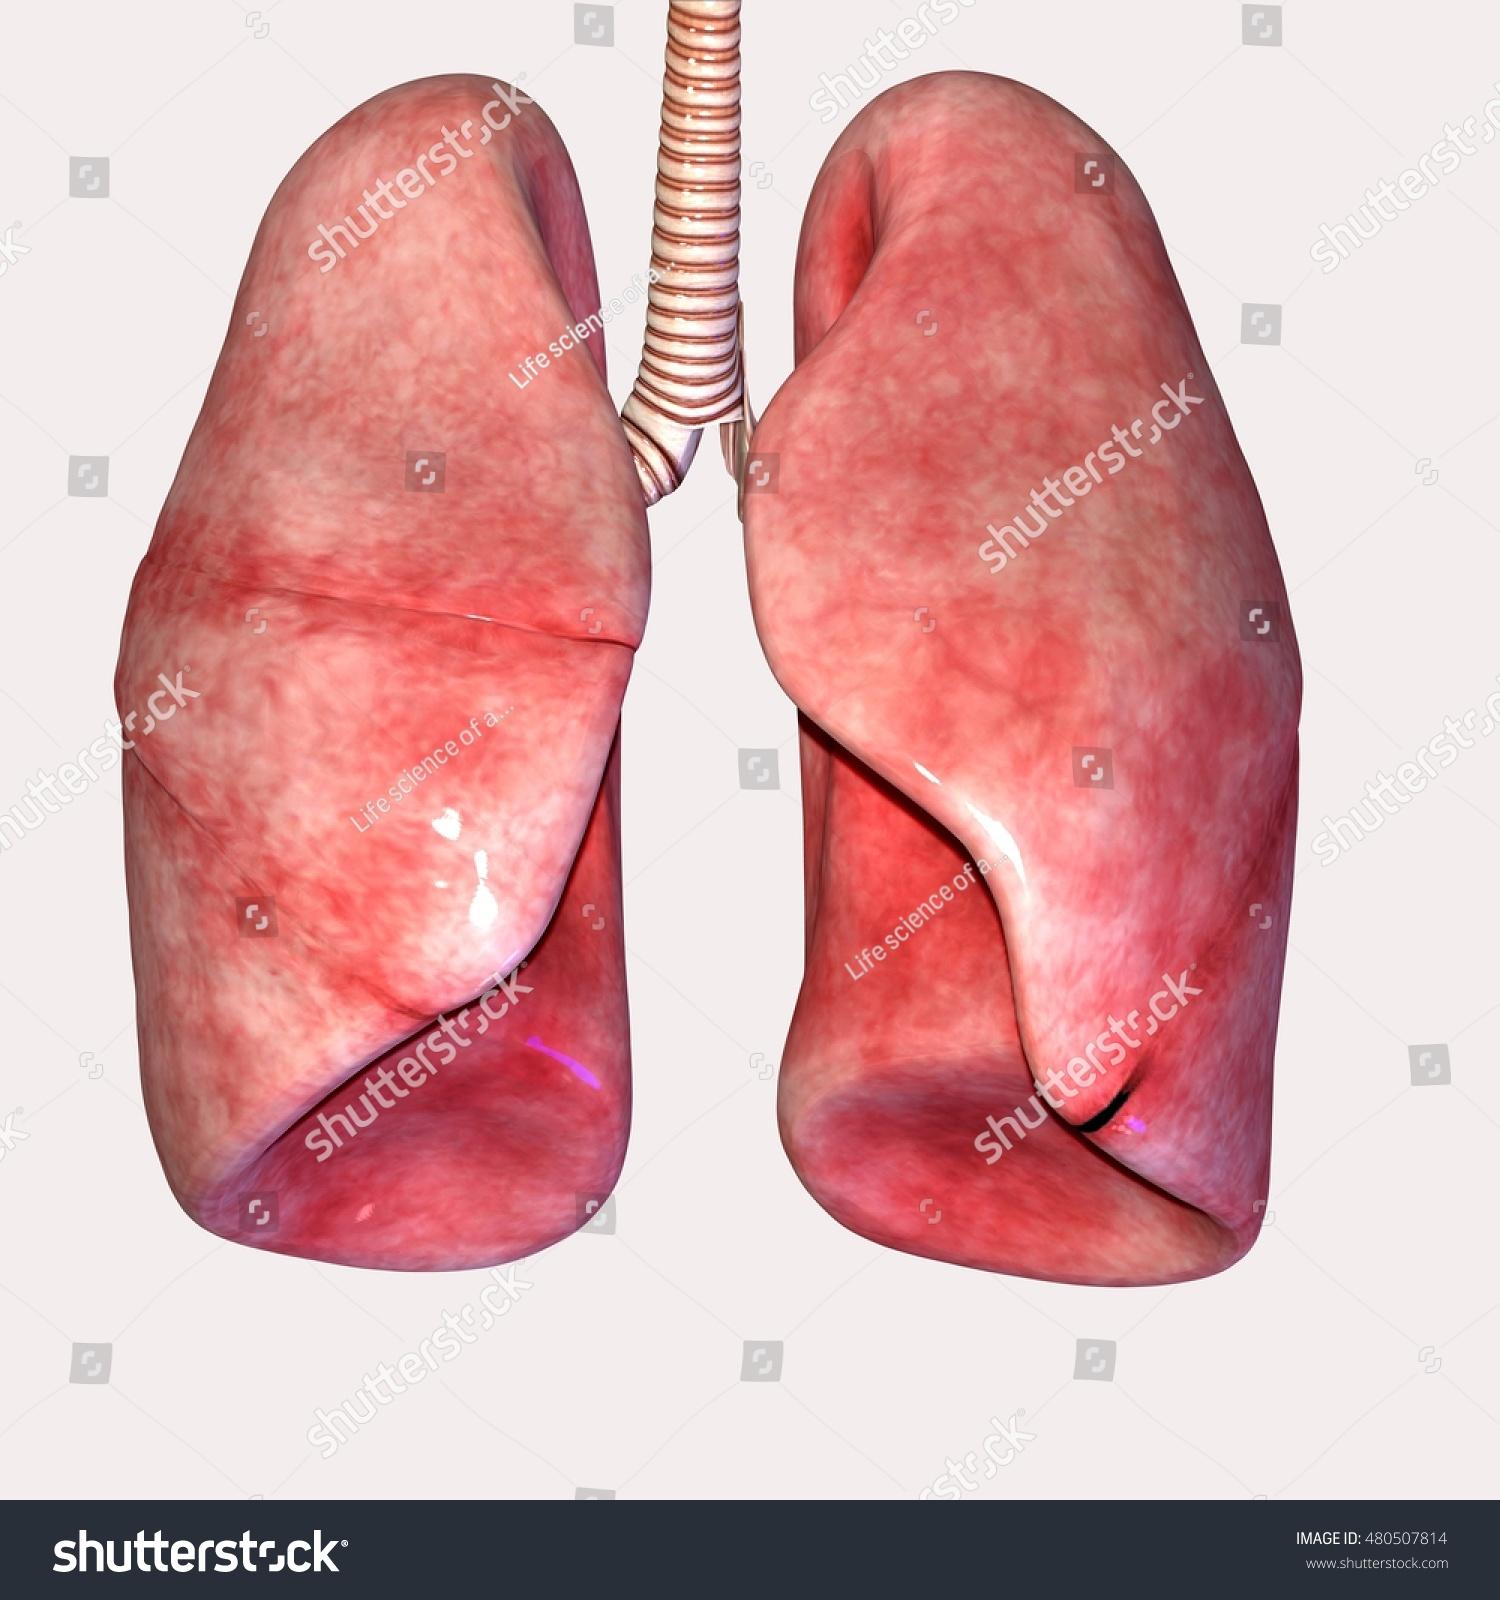 lungs human anatomy diagram basic house wiring diagrams body organs 3d stock illustration